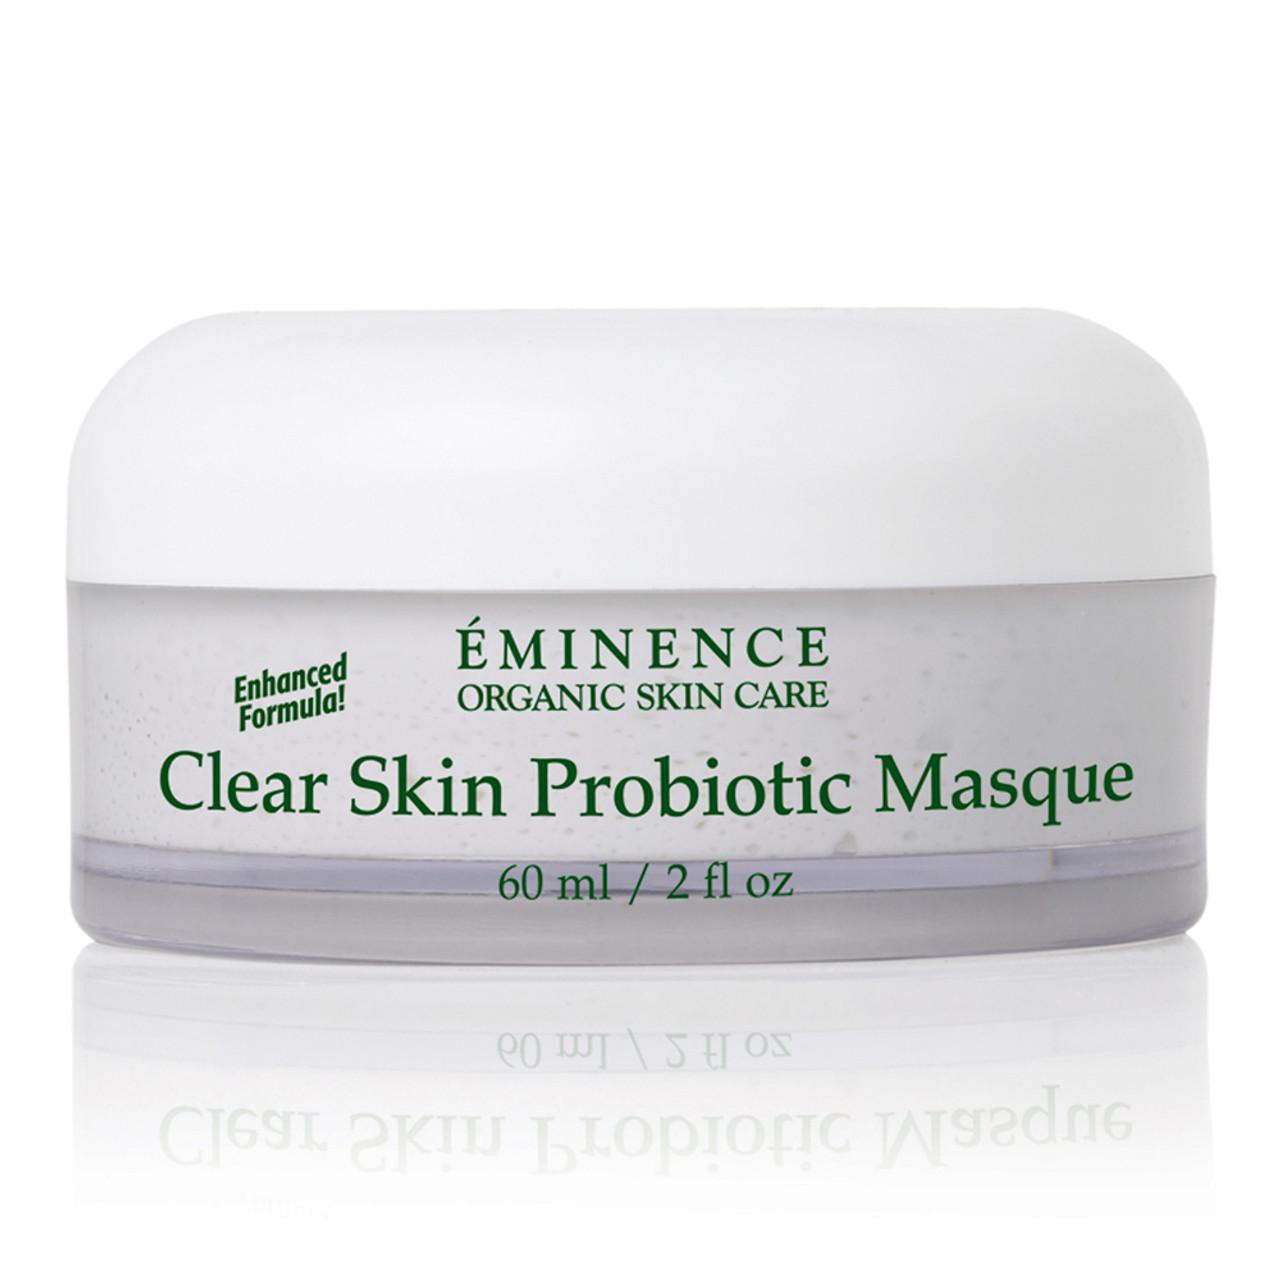 Eminence Clear Skin Probiotic Masque BeautifiedYou.com